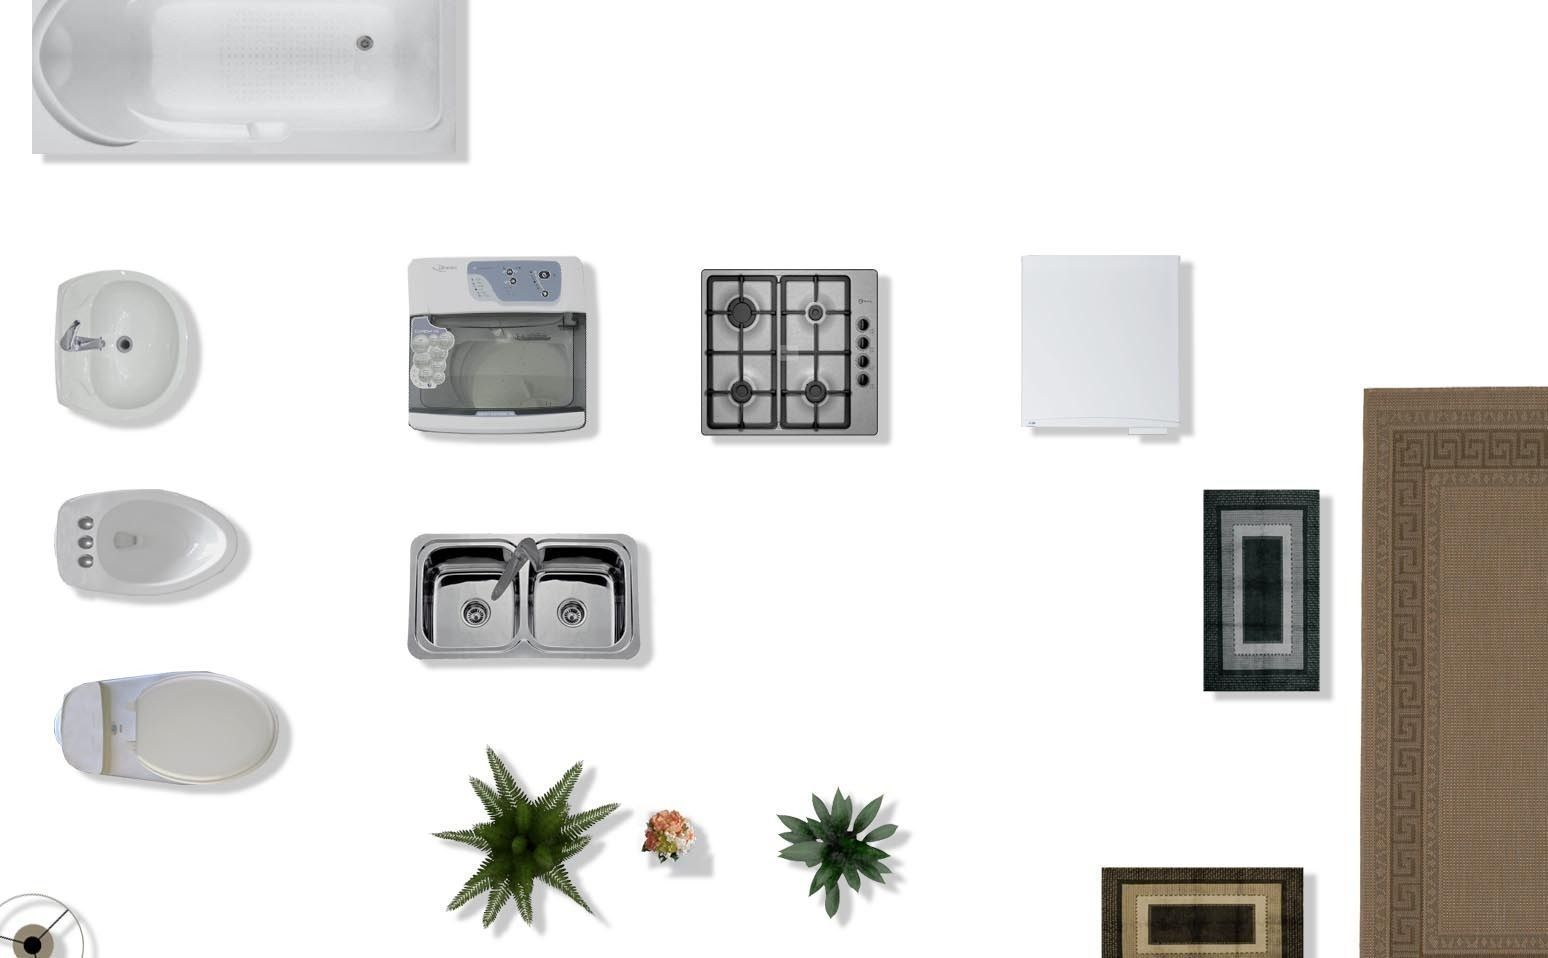 Furniture top view images -  Psd 2d Floorplan Furniture 3d Model